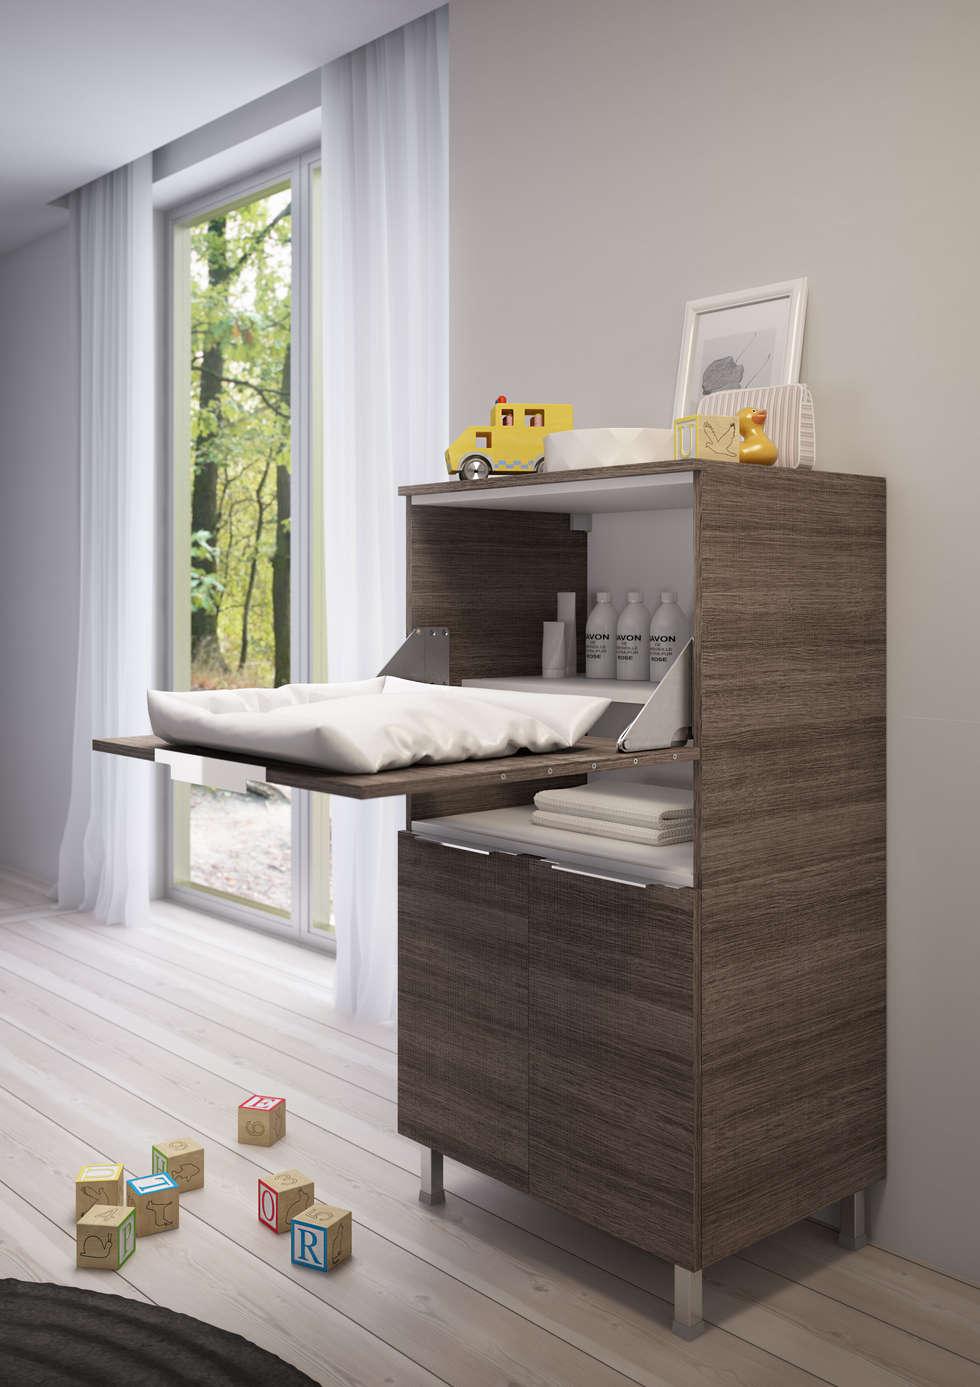 Atim Spa interior design ideas inspiration pictures homify